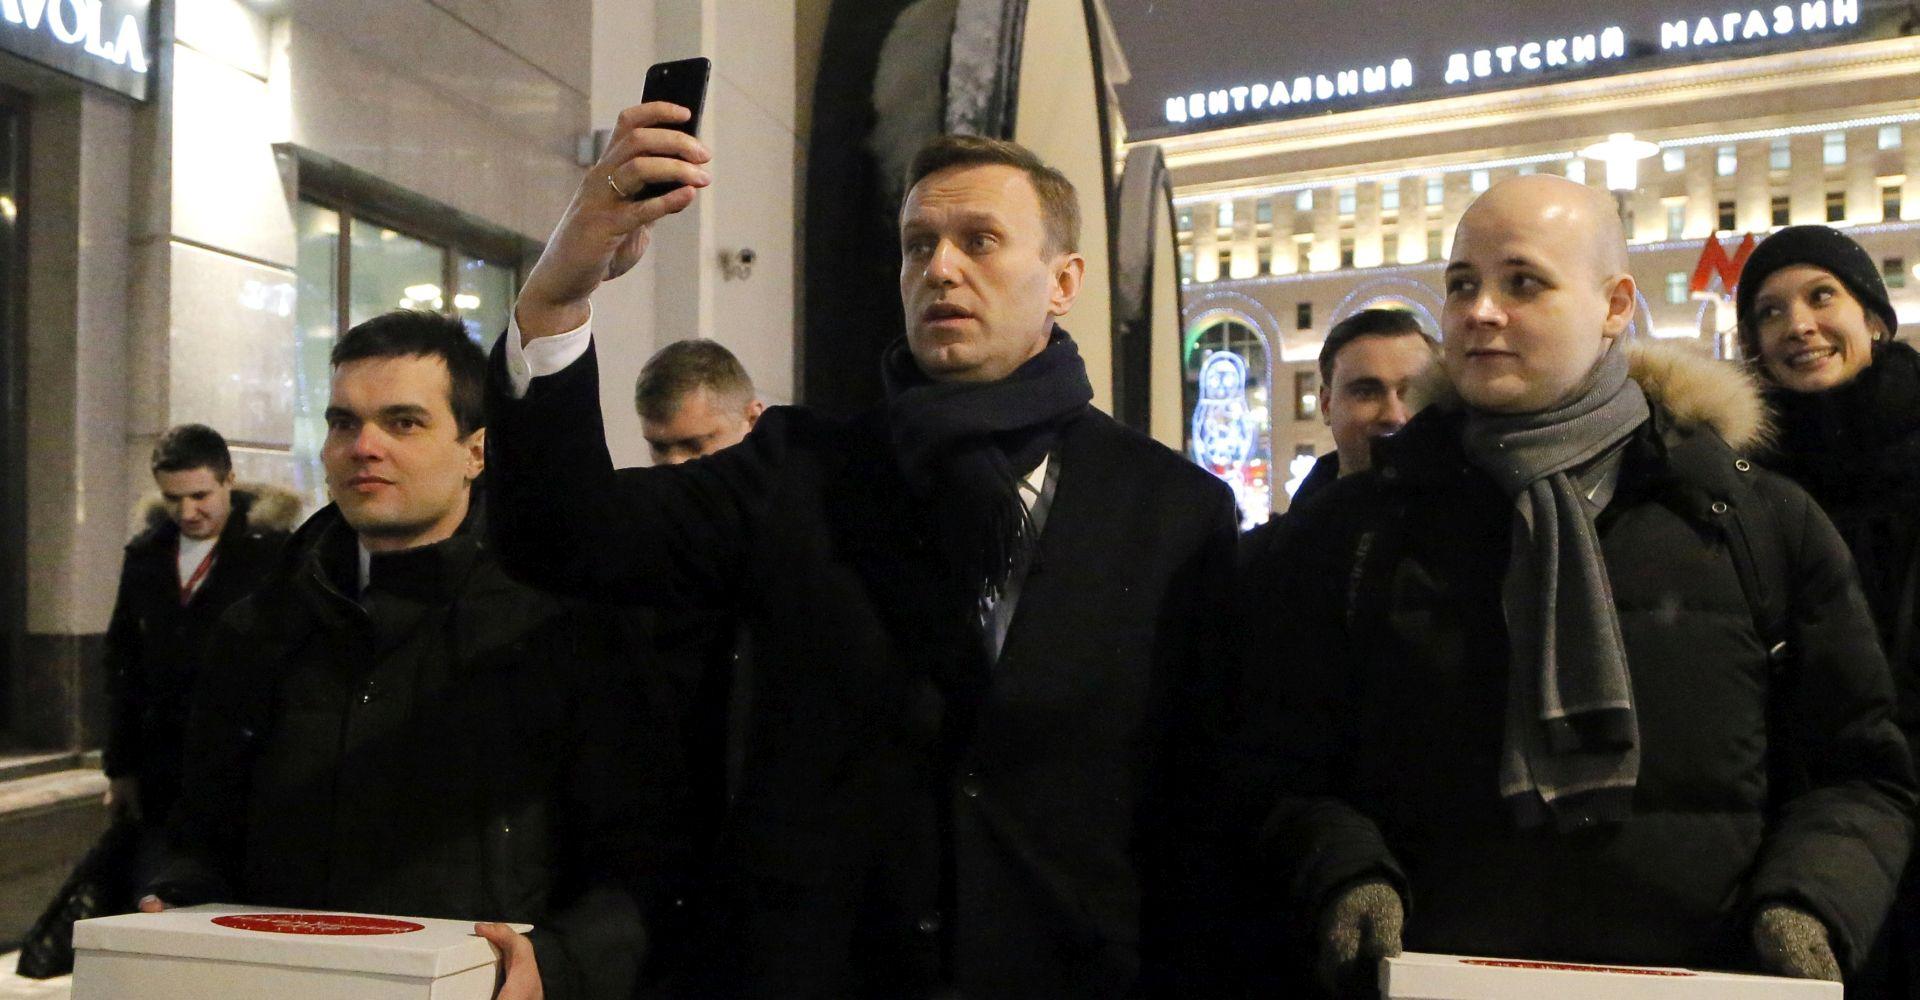 Ruska bolnica objavila da Navaljni nije otrovan